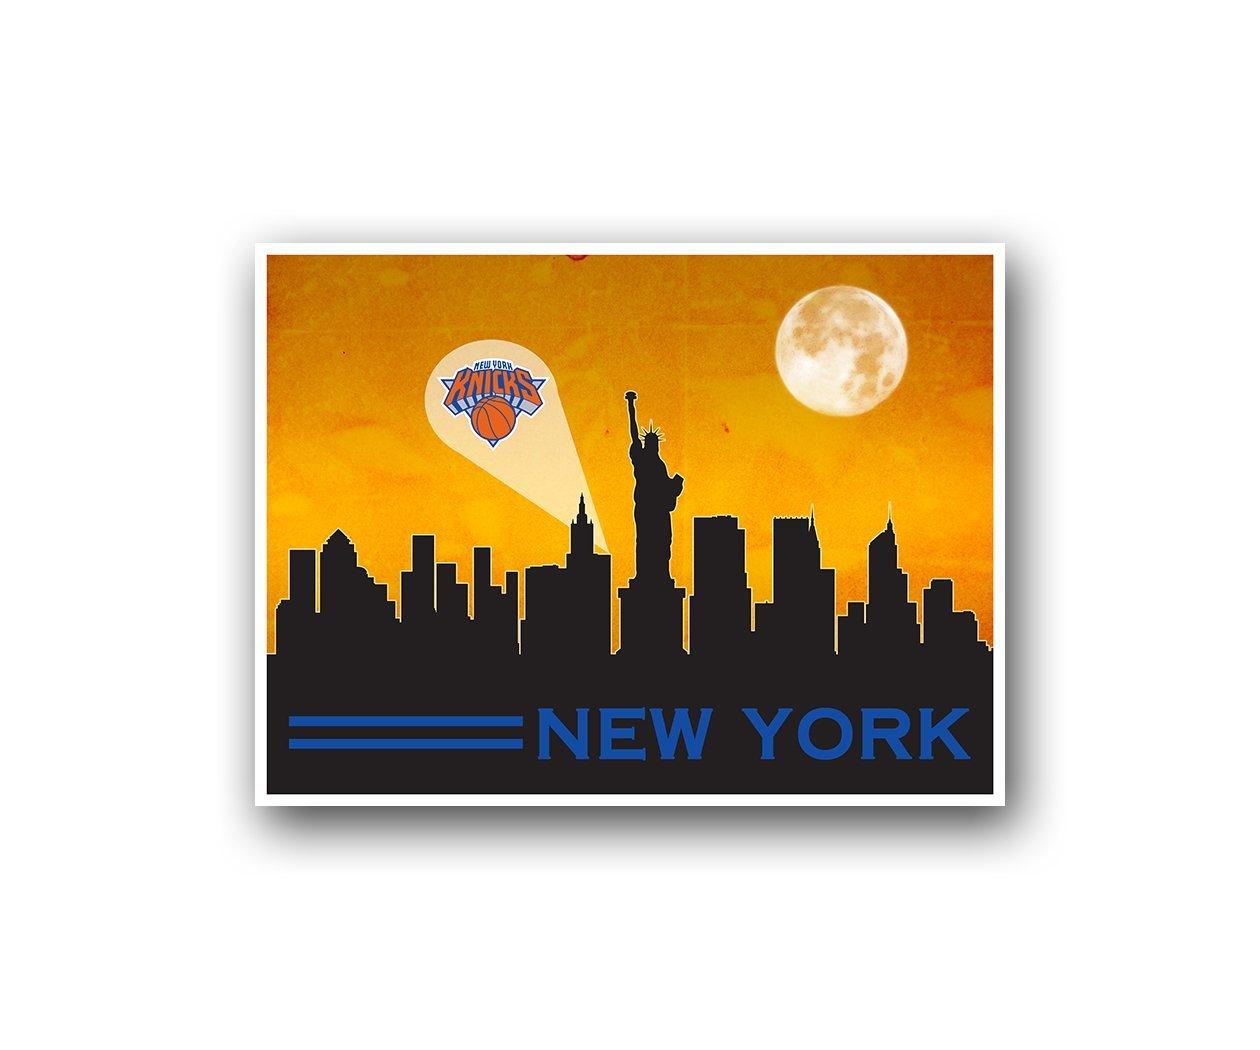 Amazon.com : New York Knicks Poster Sports Art City Skyline Print ...